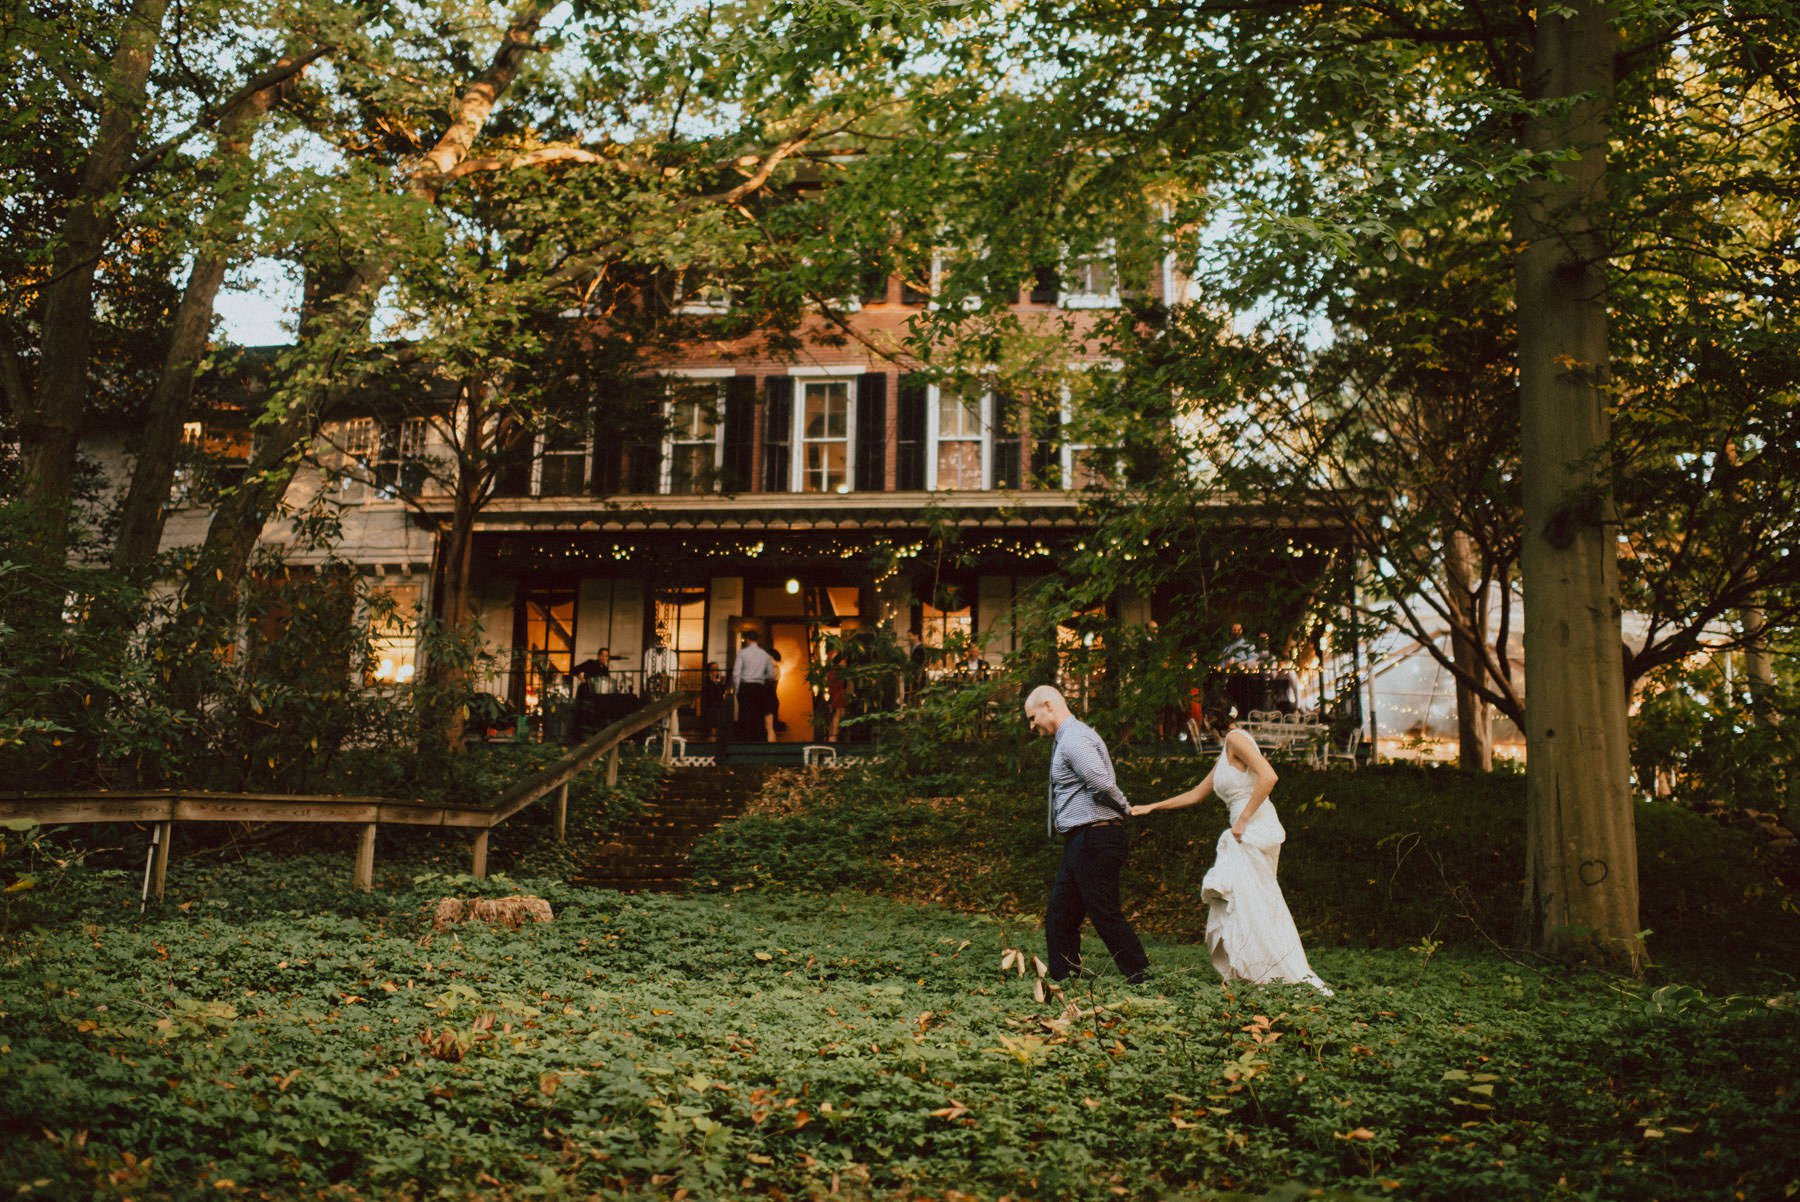 faunbrook-bed-and-breakfast-wedding-118.jpg